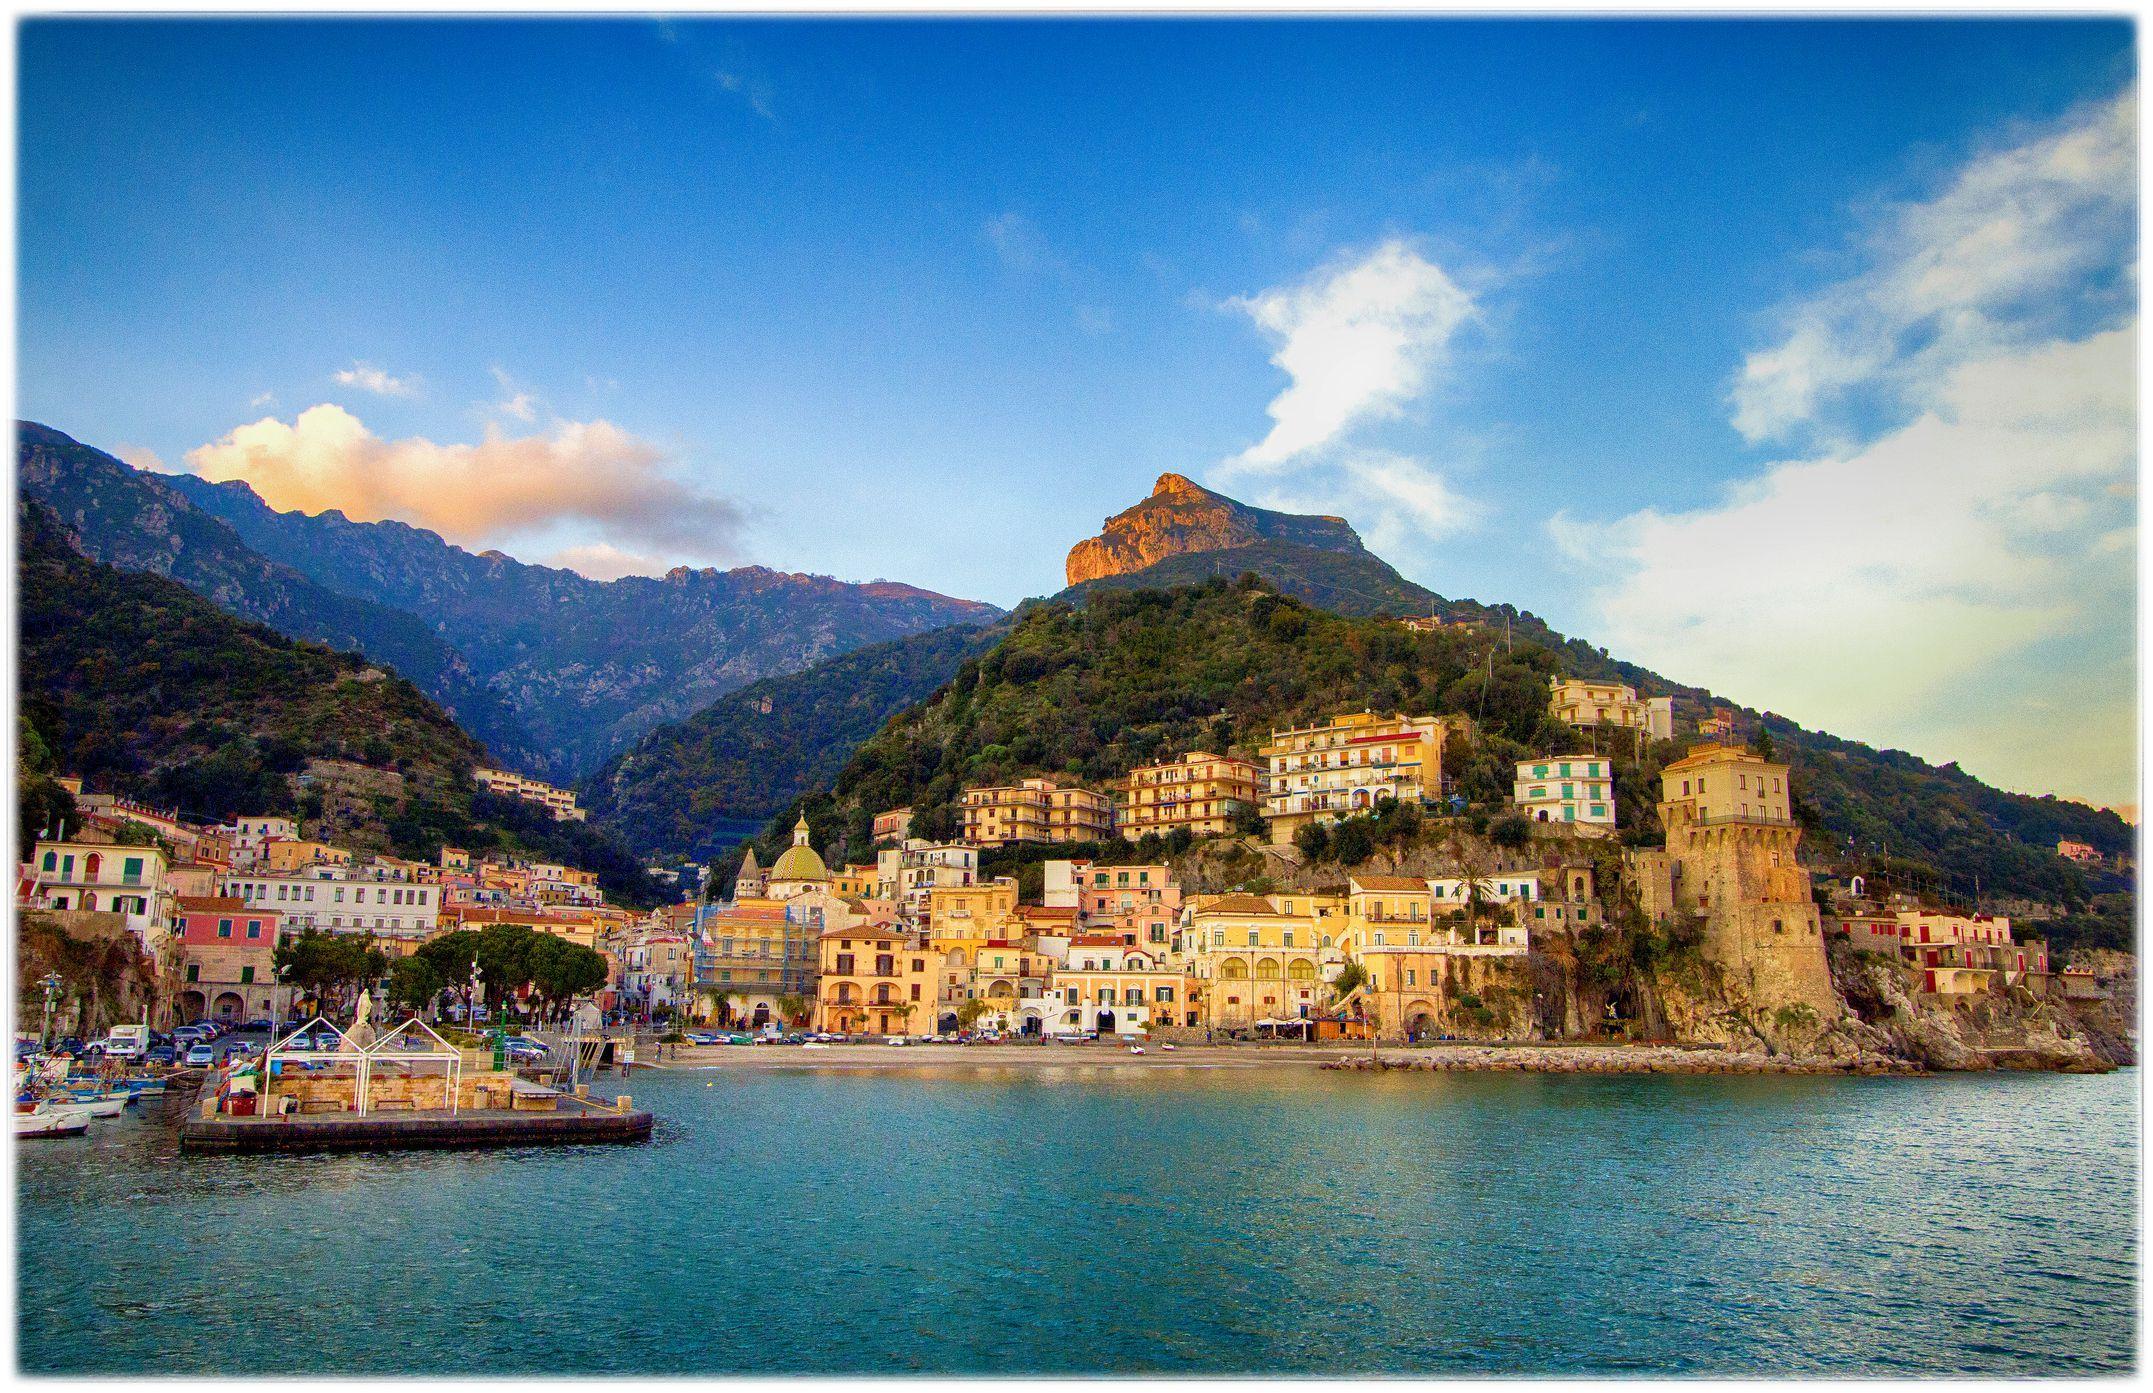 19dbccbdb44443d02f8df35beb7ddf2e - How Do You Get From Rome To Amalfi Coast